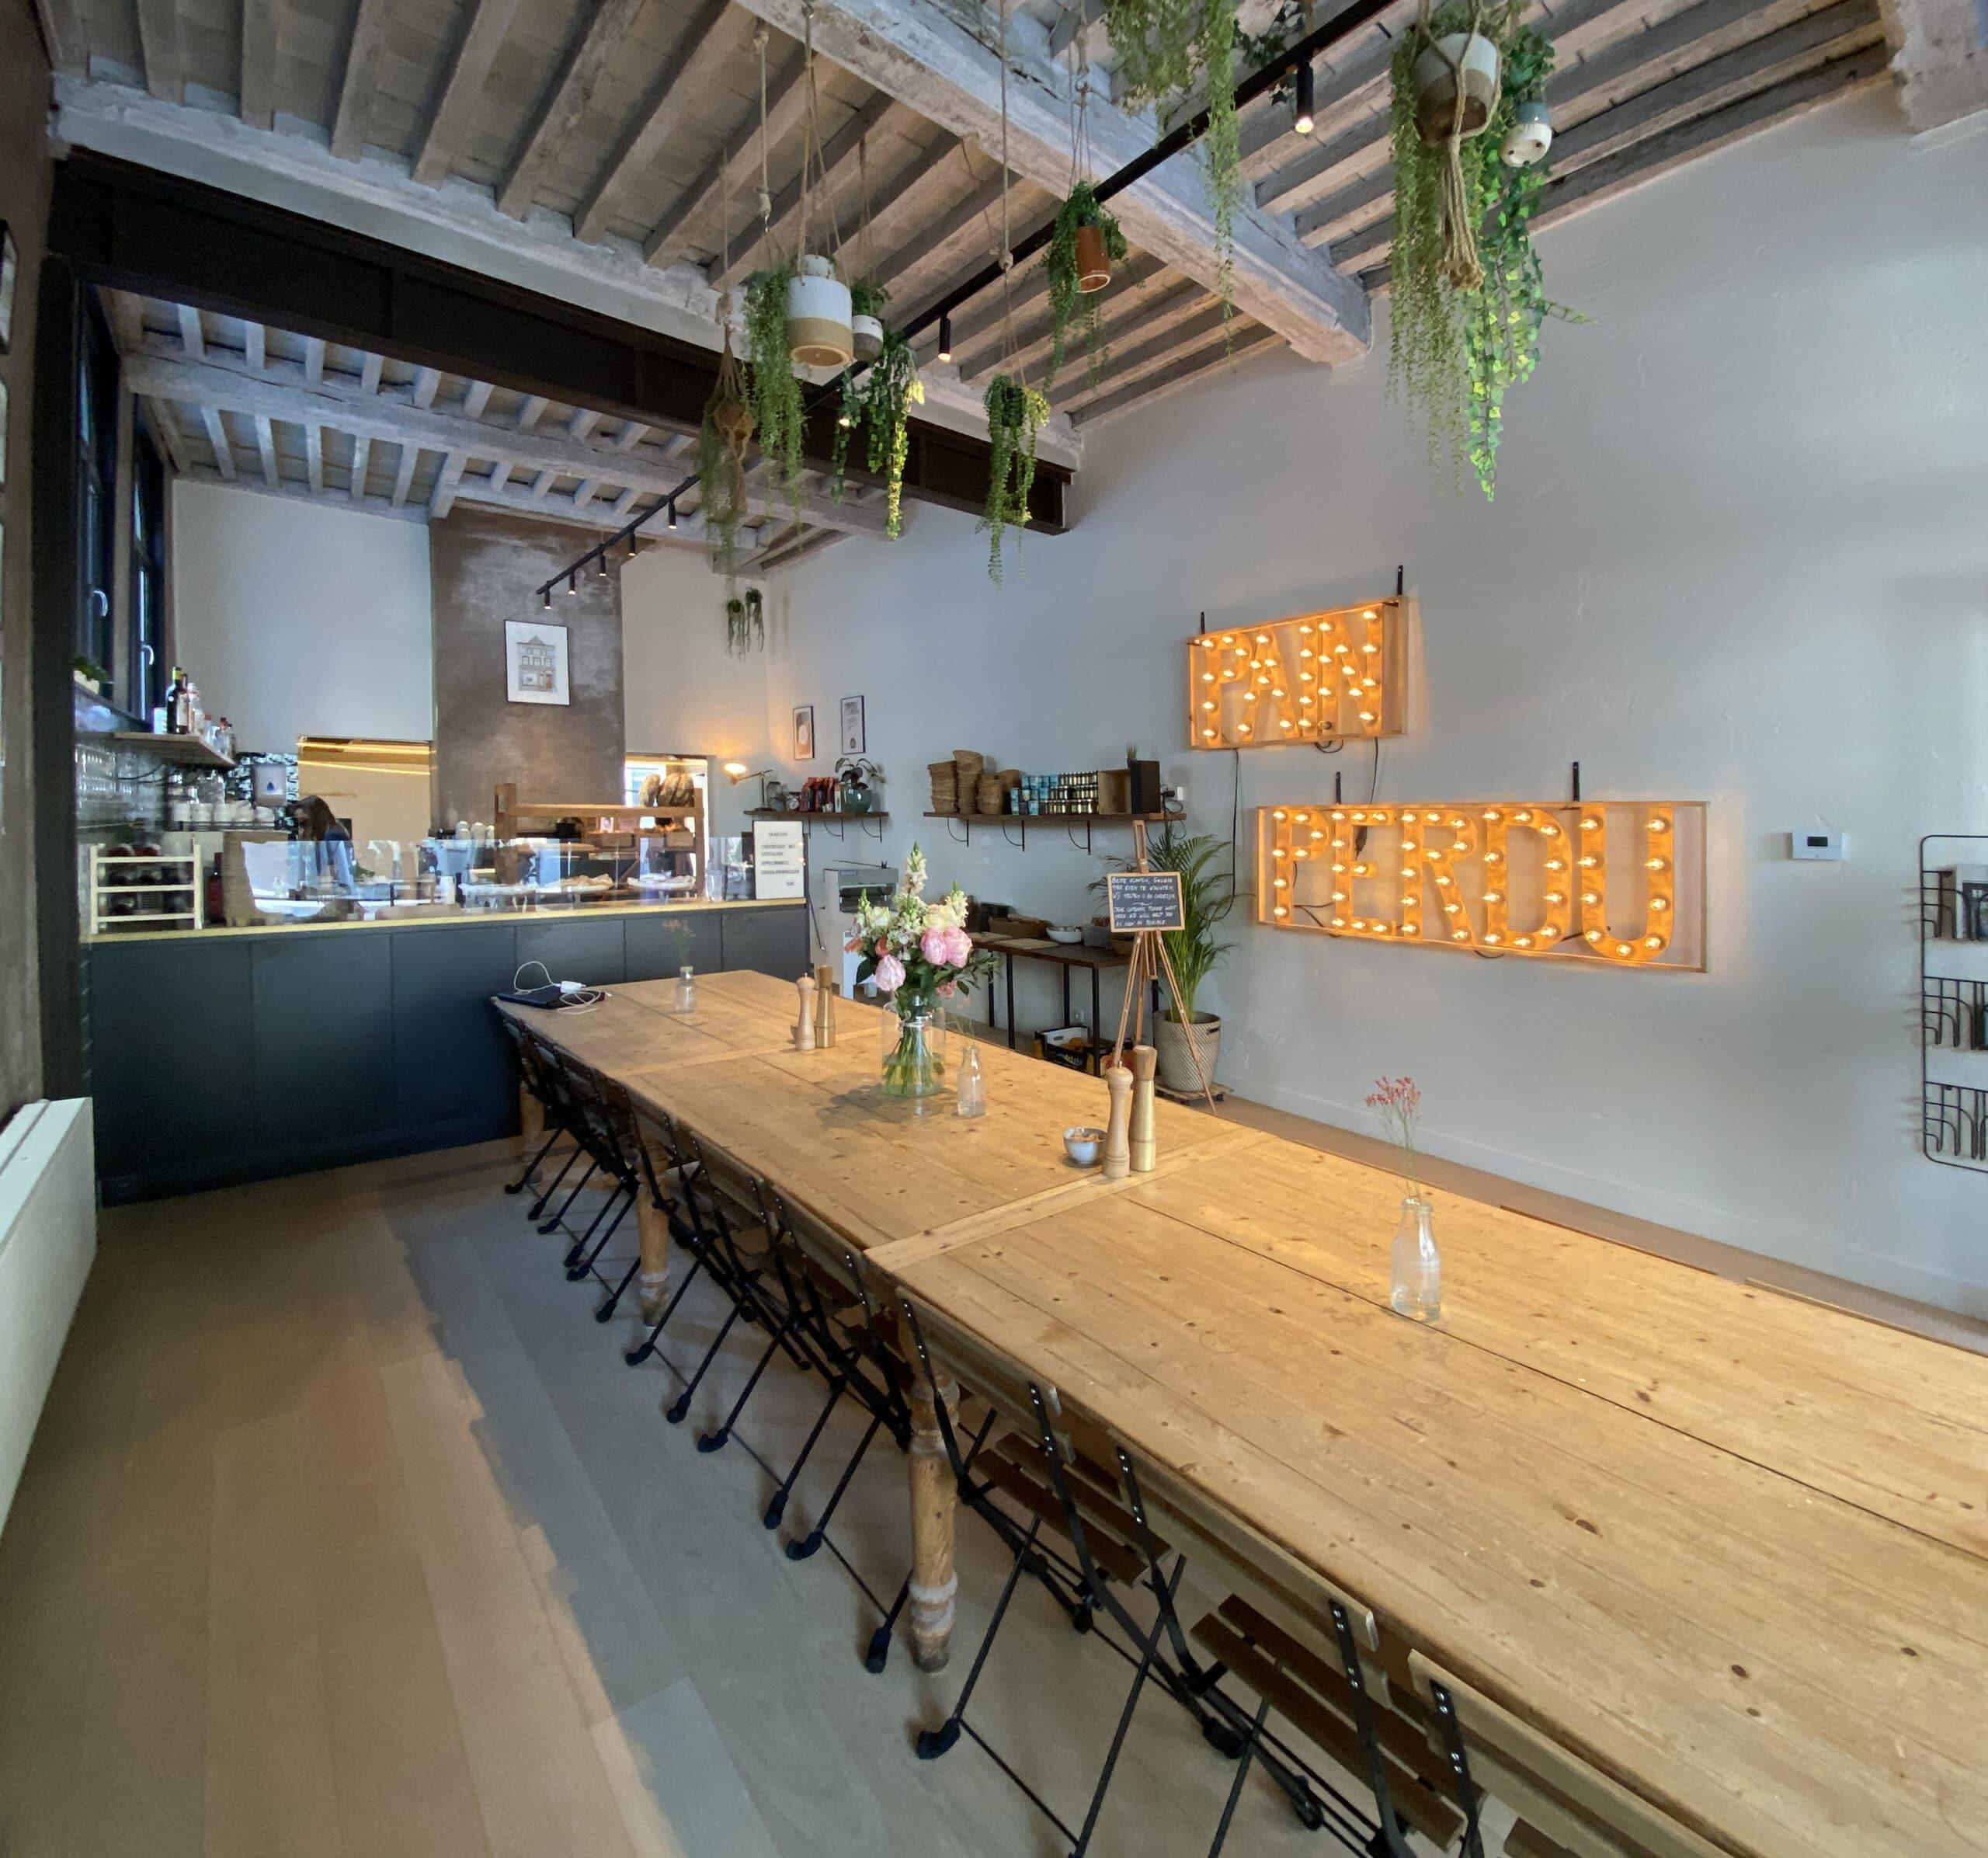 IMG 8153 2 scaled | Baeyens & Beck architecten Gent | architect nieuwbouw renovatie interieur | high end | architectenbureau